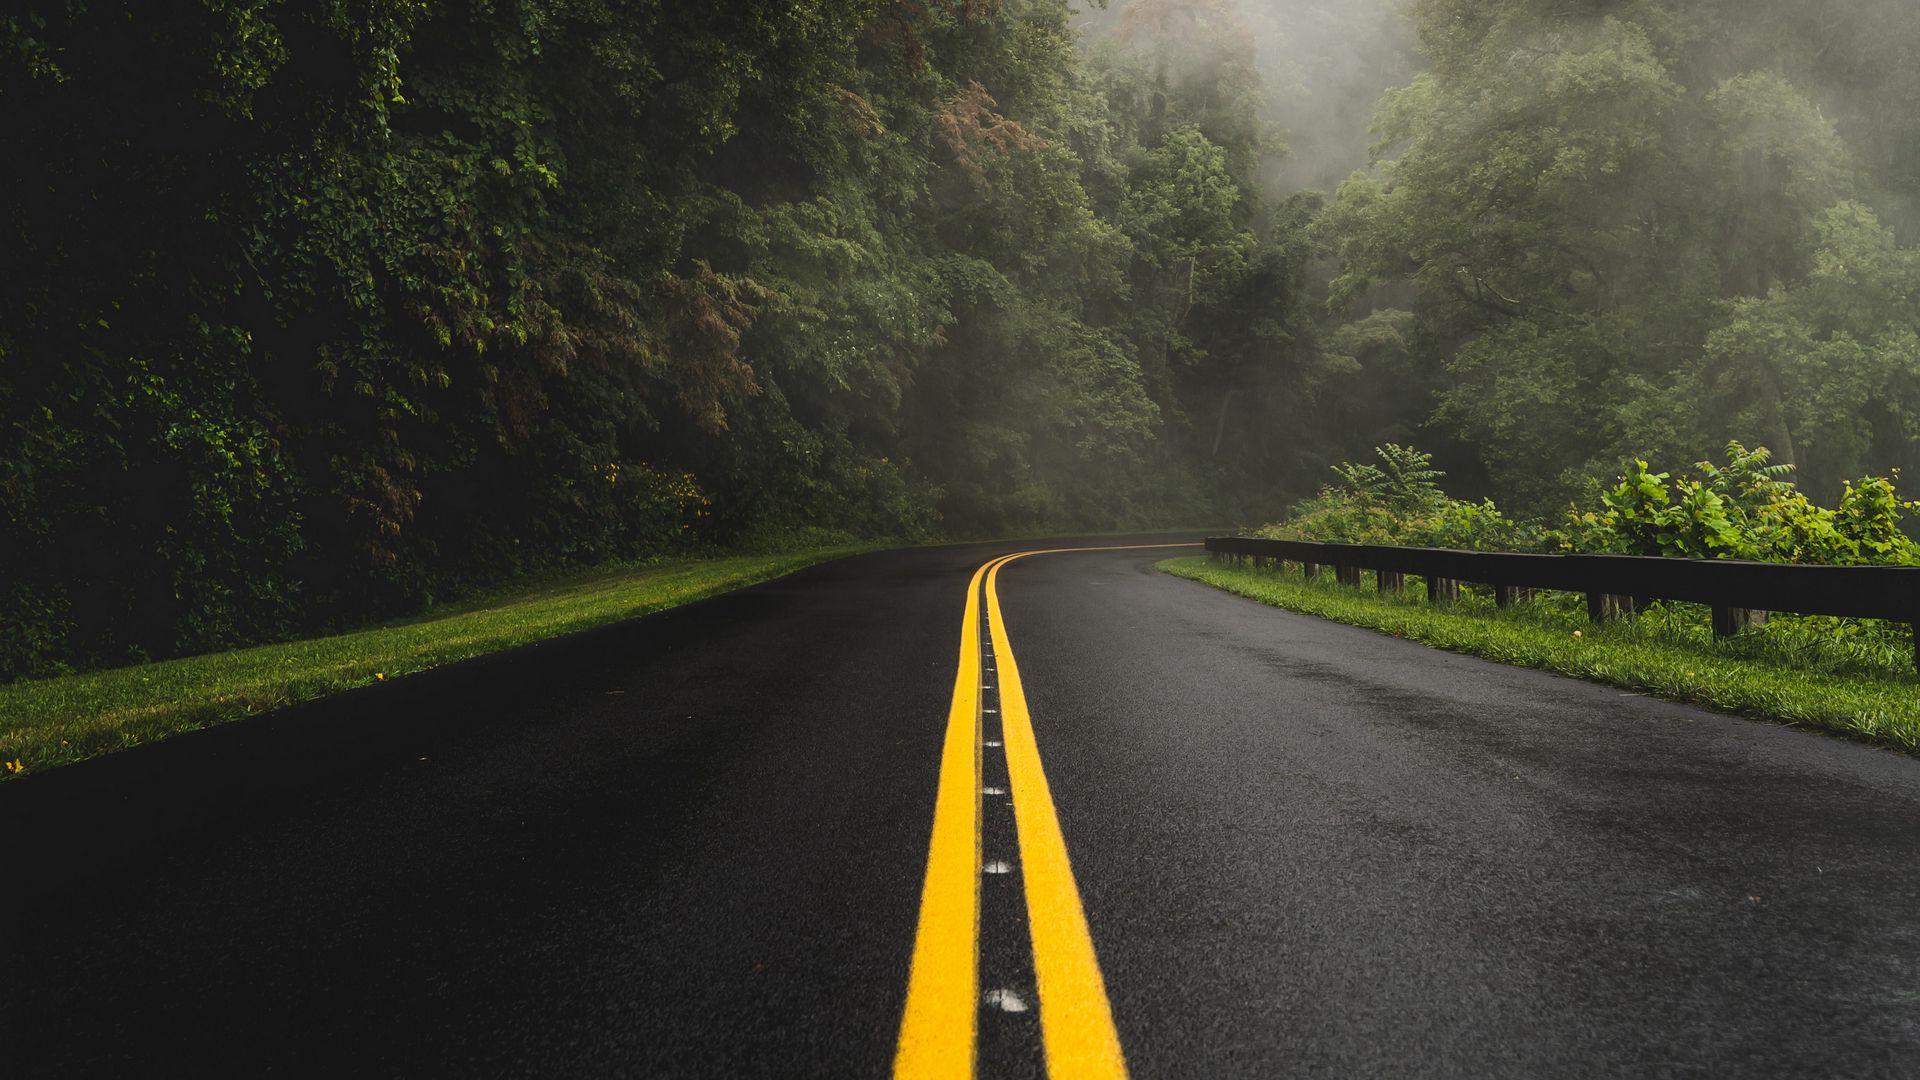 General 1920x1080 landscape nature road forest wet road trees mist plants